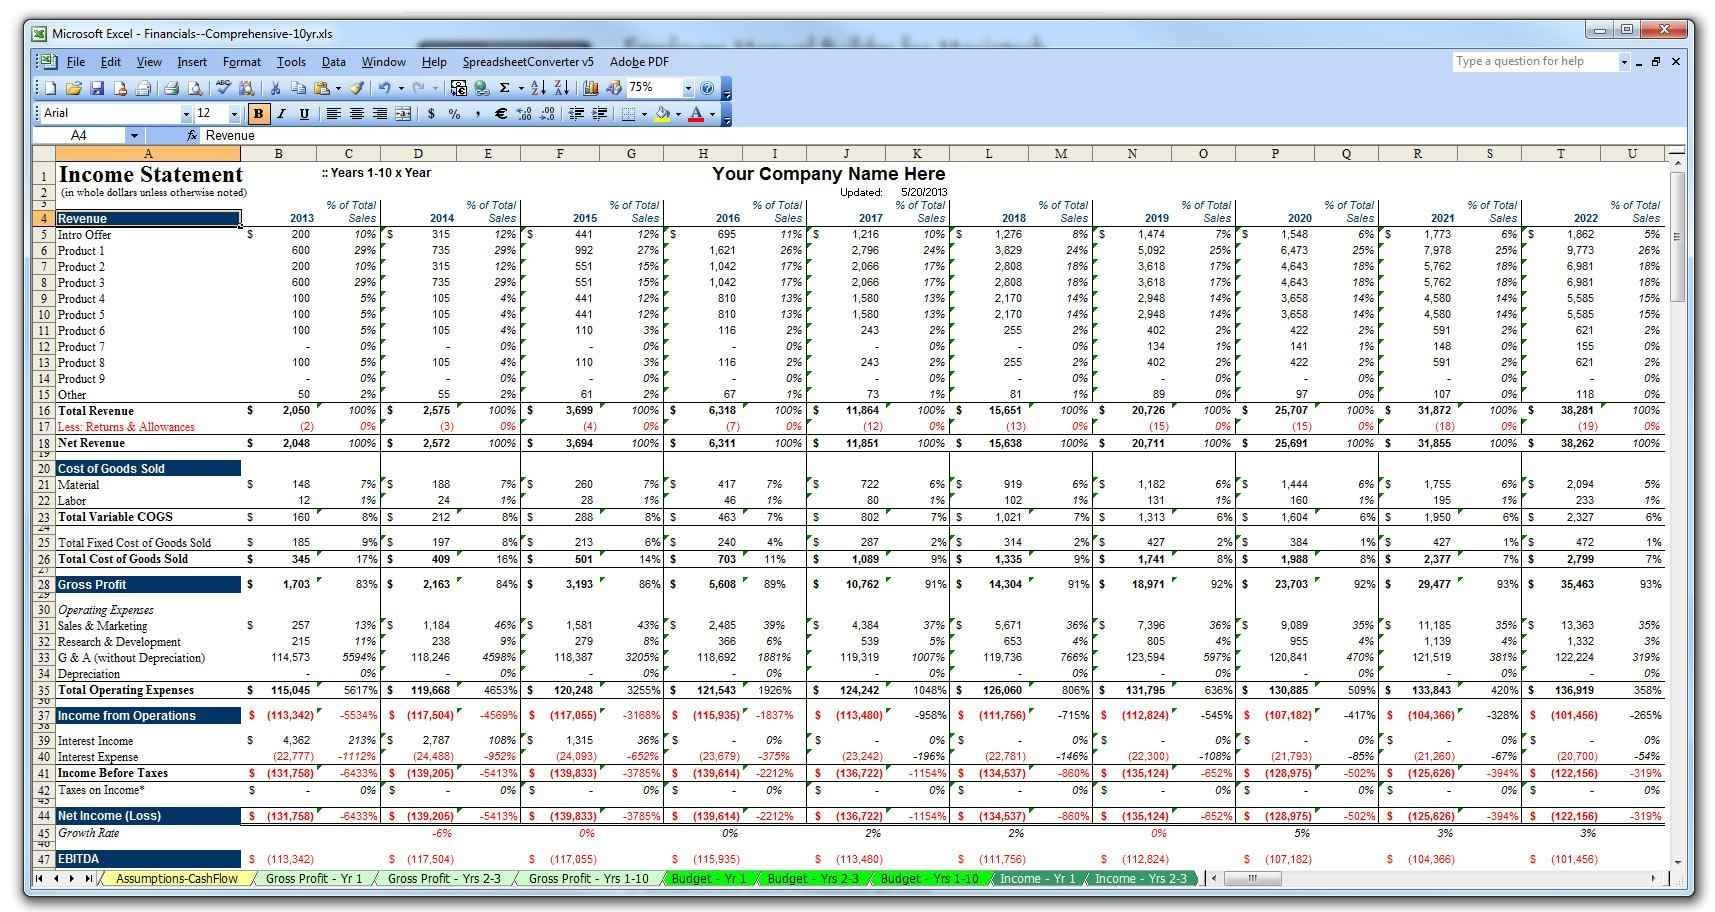 002 Unusual Financial Plan Template Excel Image  Strategic Busines SimpleFull